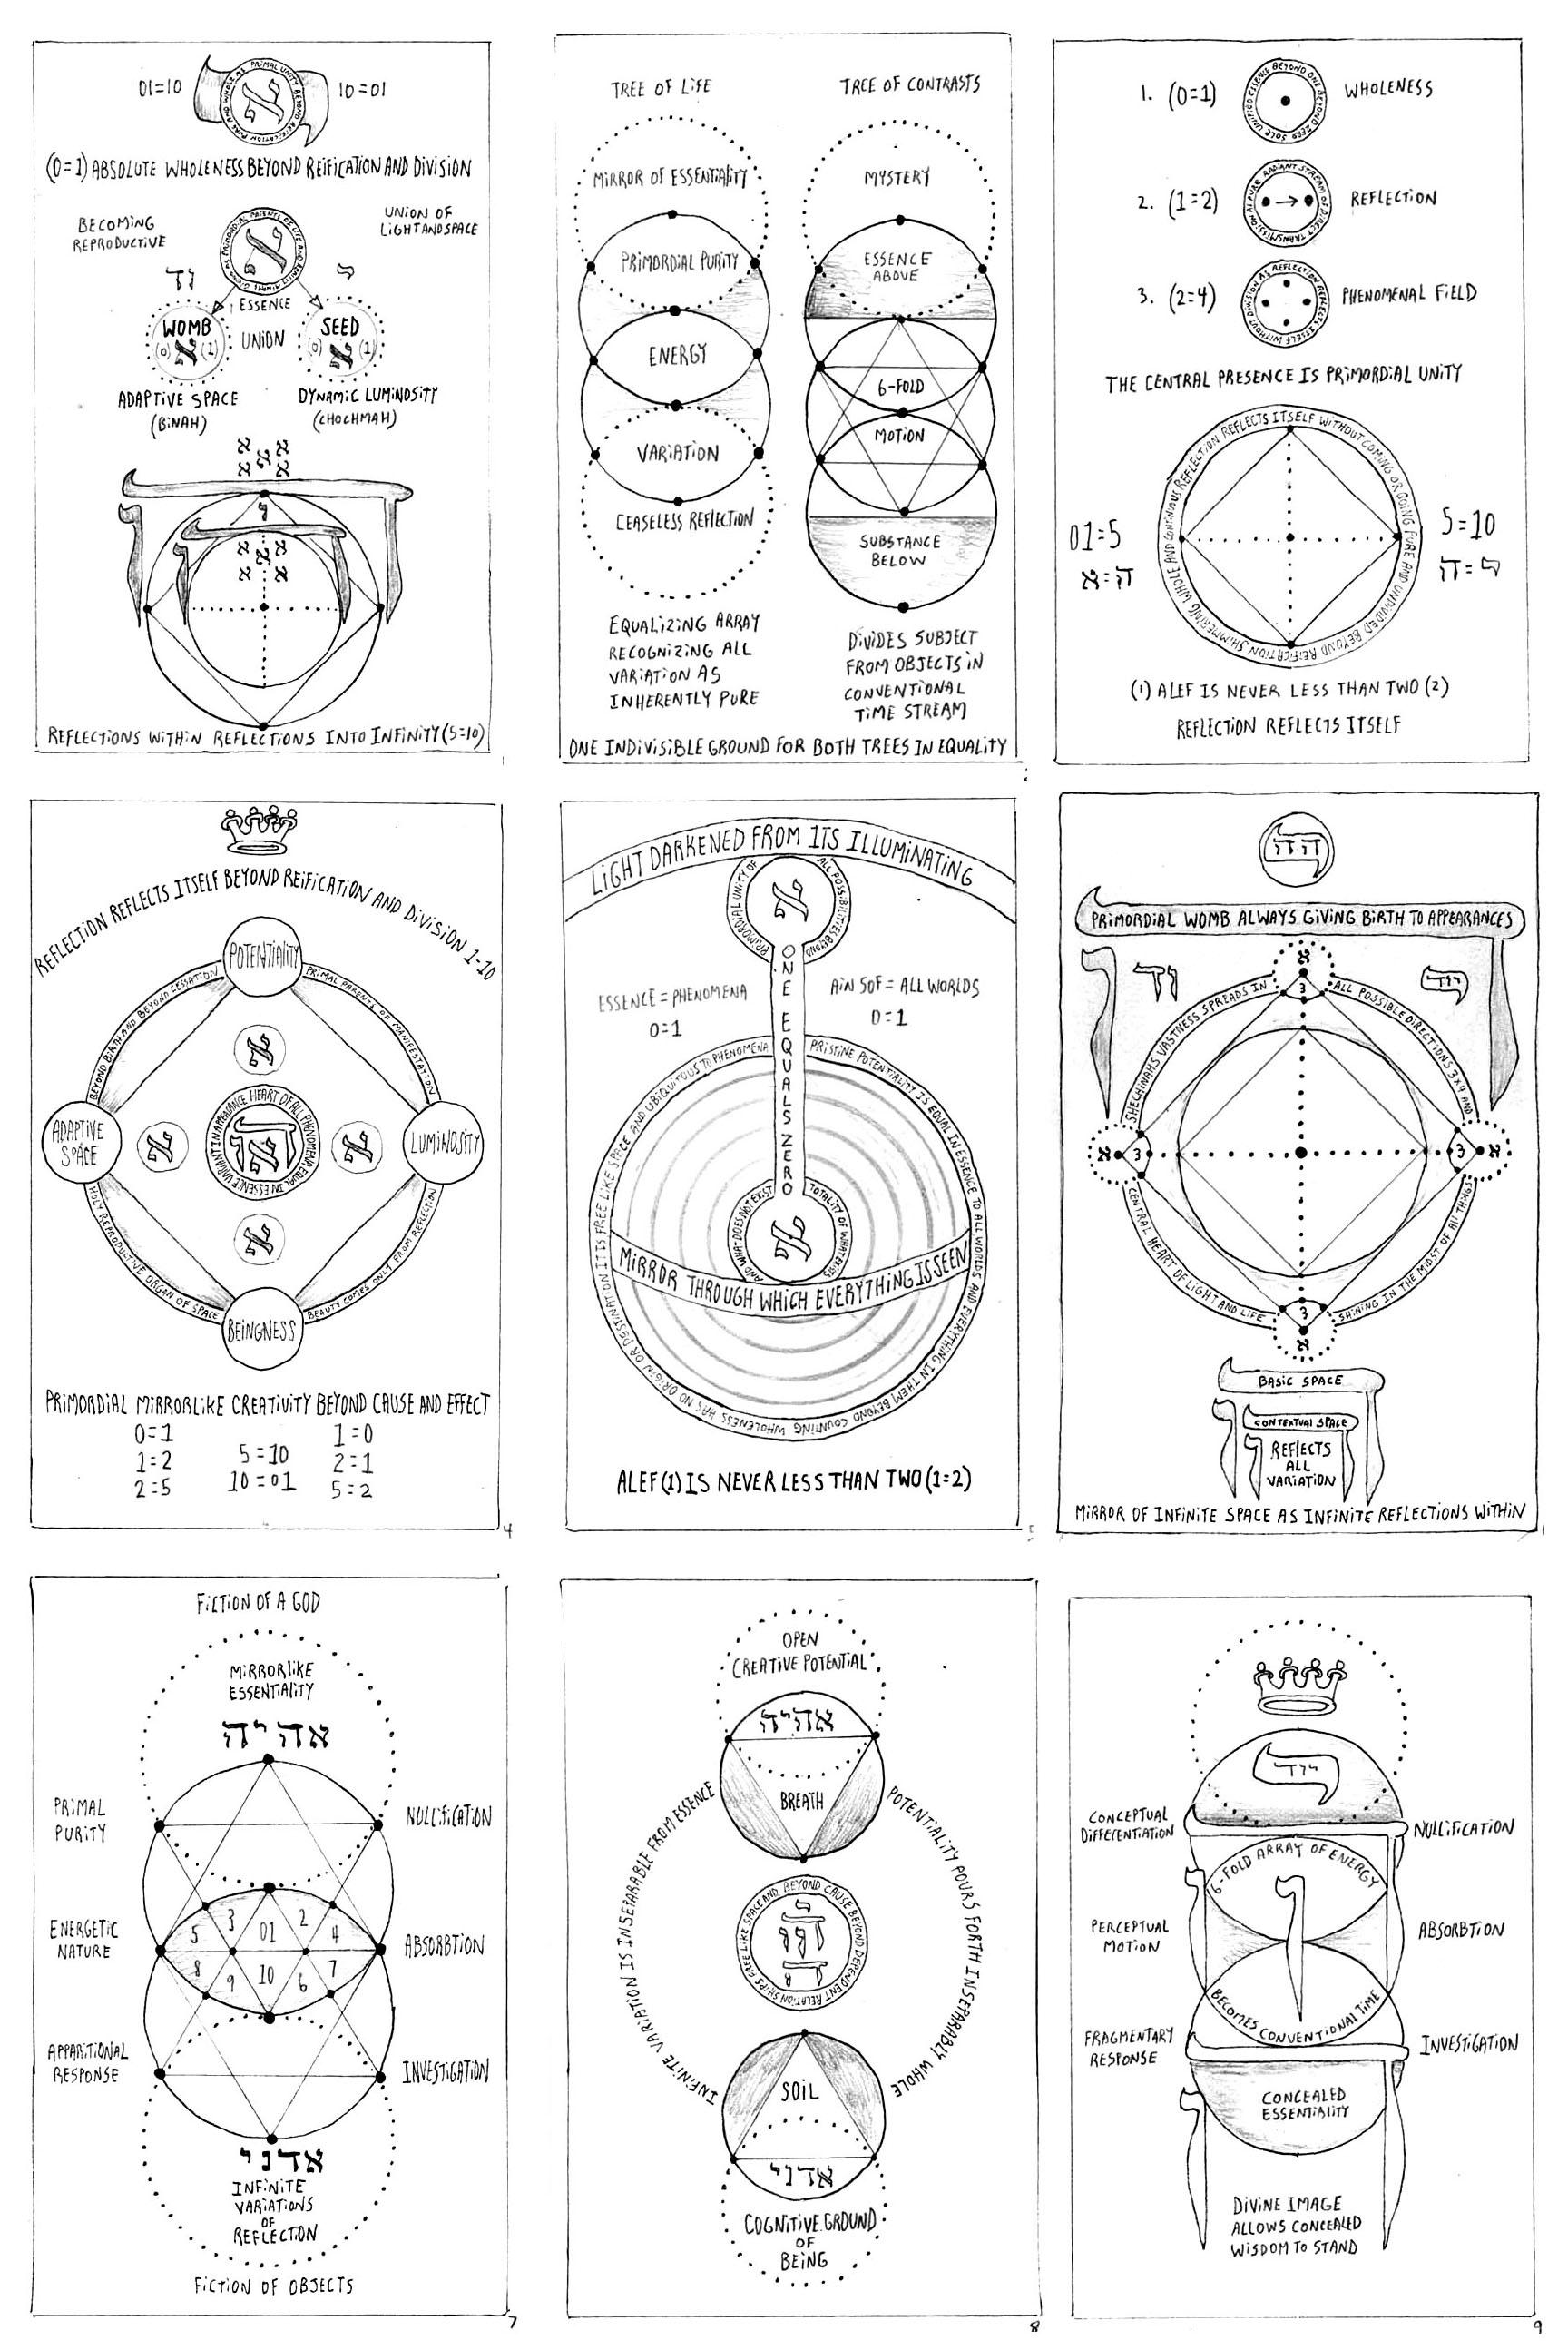 David Chaim Smith Nine Essential Keys (nine cards), 2010 Pencil and ink on paper 4 x 6 inches (each card) / 10.2 x 15.2 cm / DCS 32